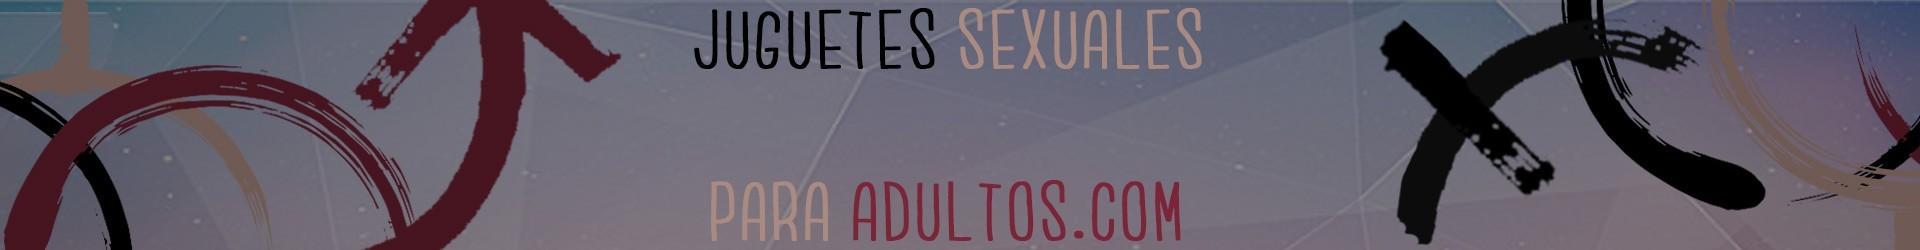 Boxers - Juguetes Sexuales para Adultos